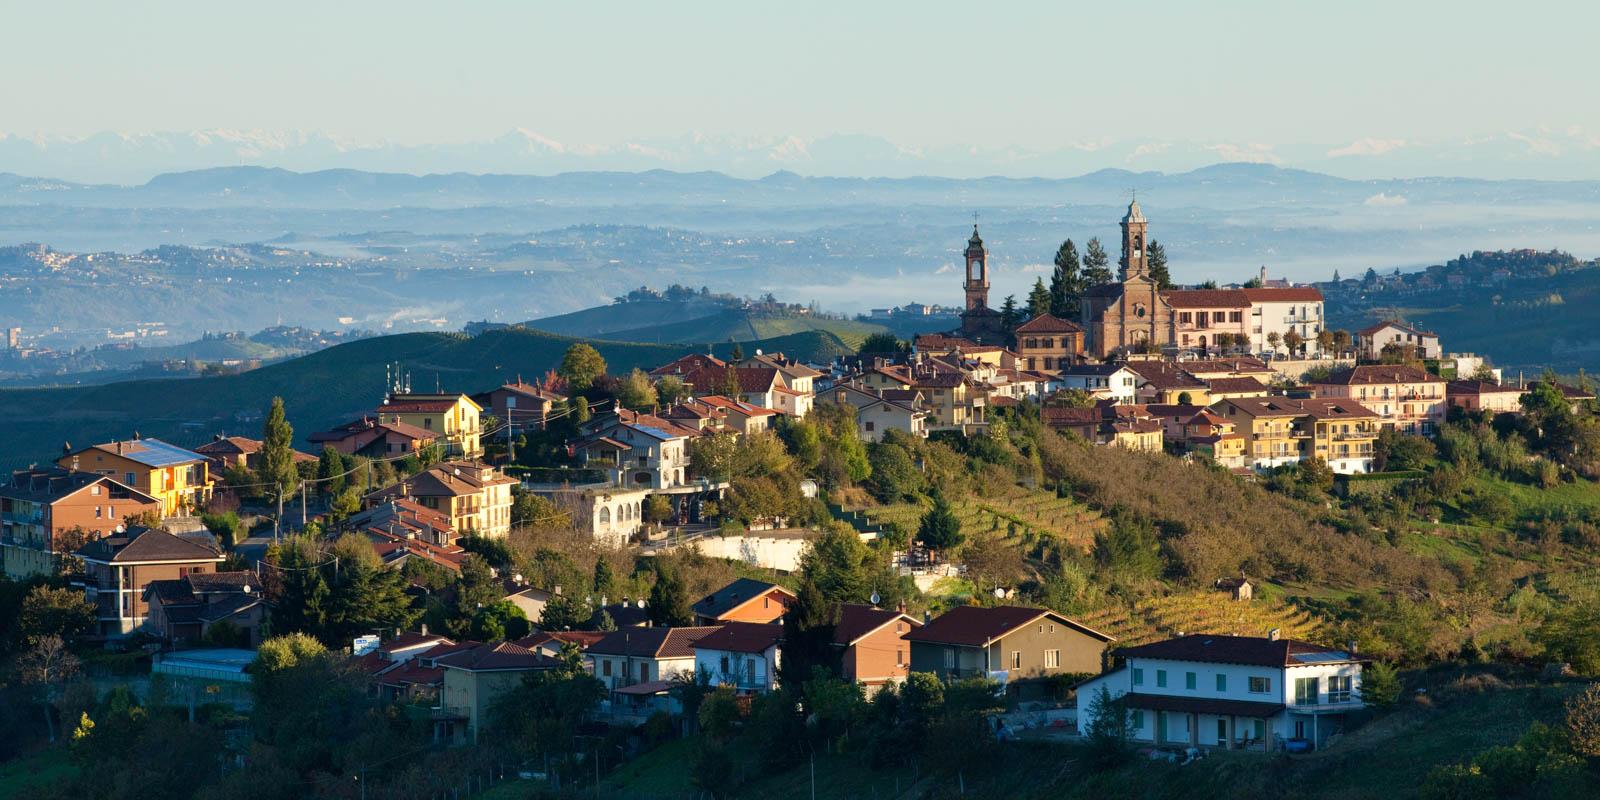 Montelupo Albese, Italy